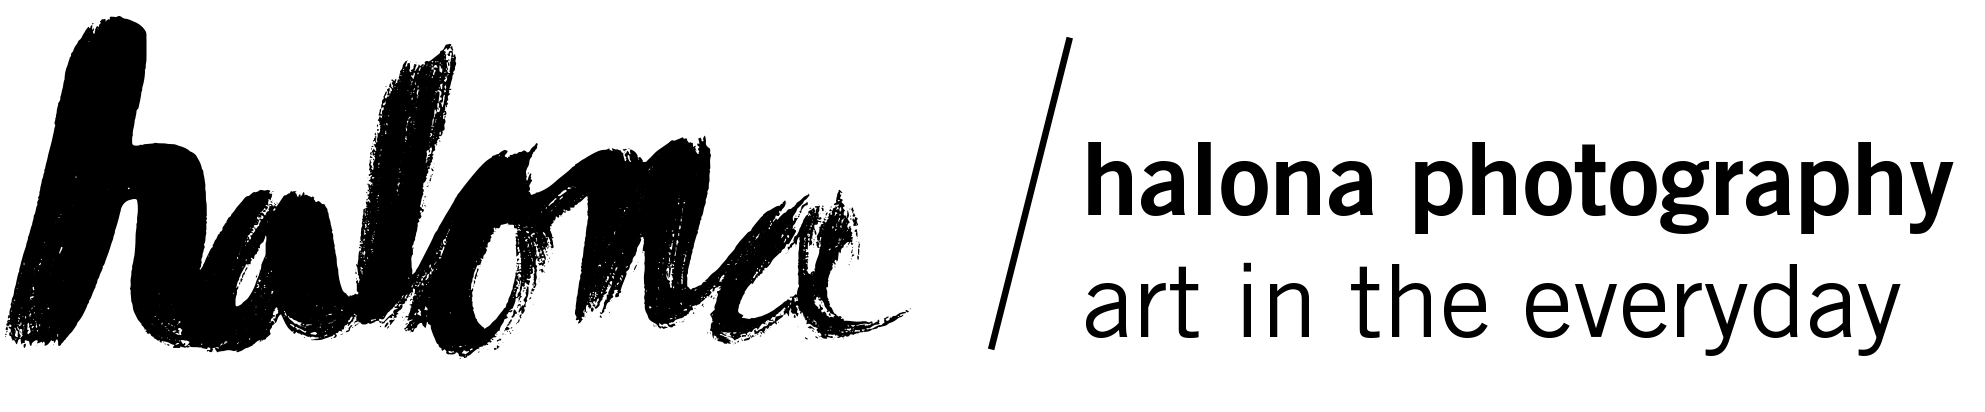 Halona_Logo_TaglineFull_Black.png